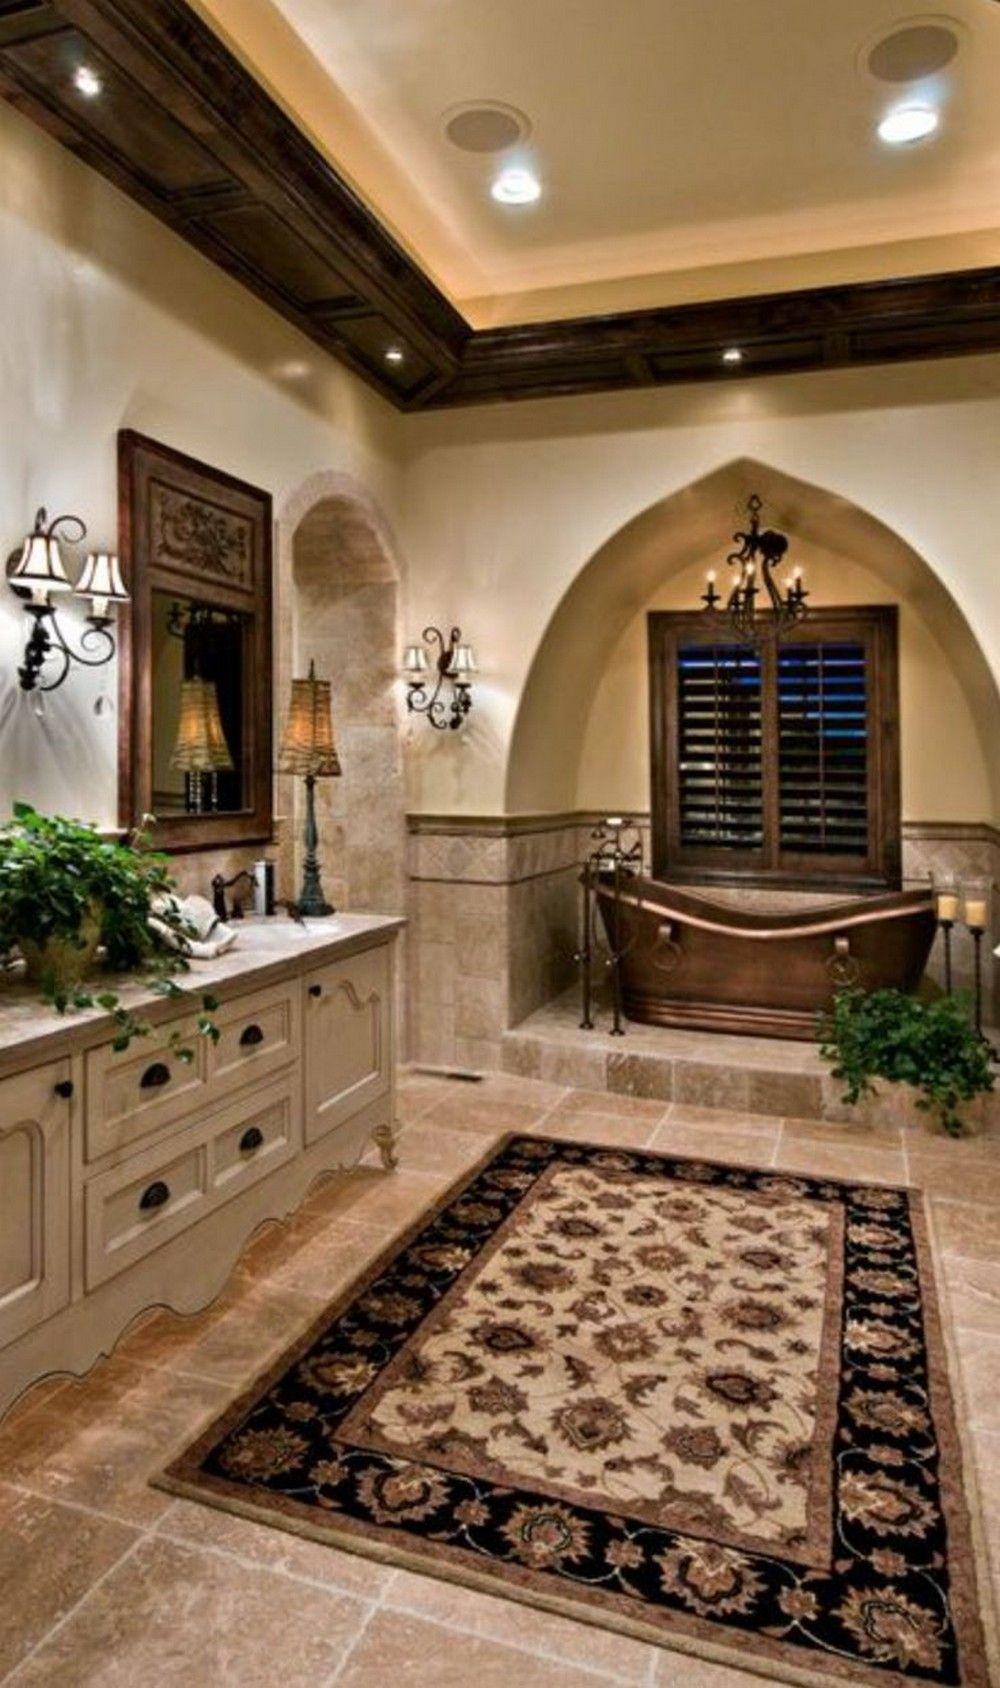 Tuscan decorating ideas for bathroom - 30 Luxurious Tuscan Bathroom Decor Ideas